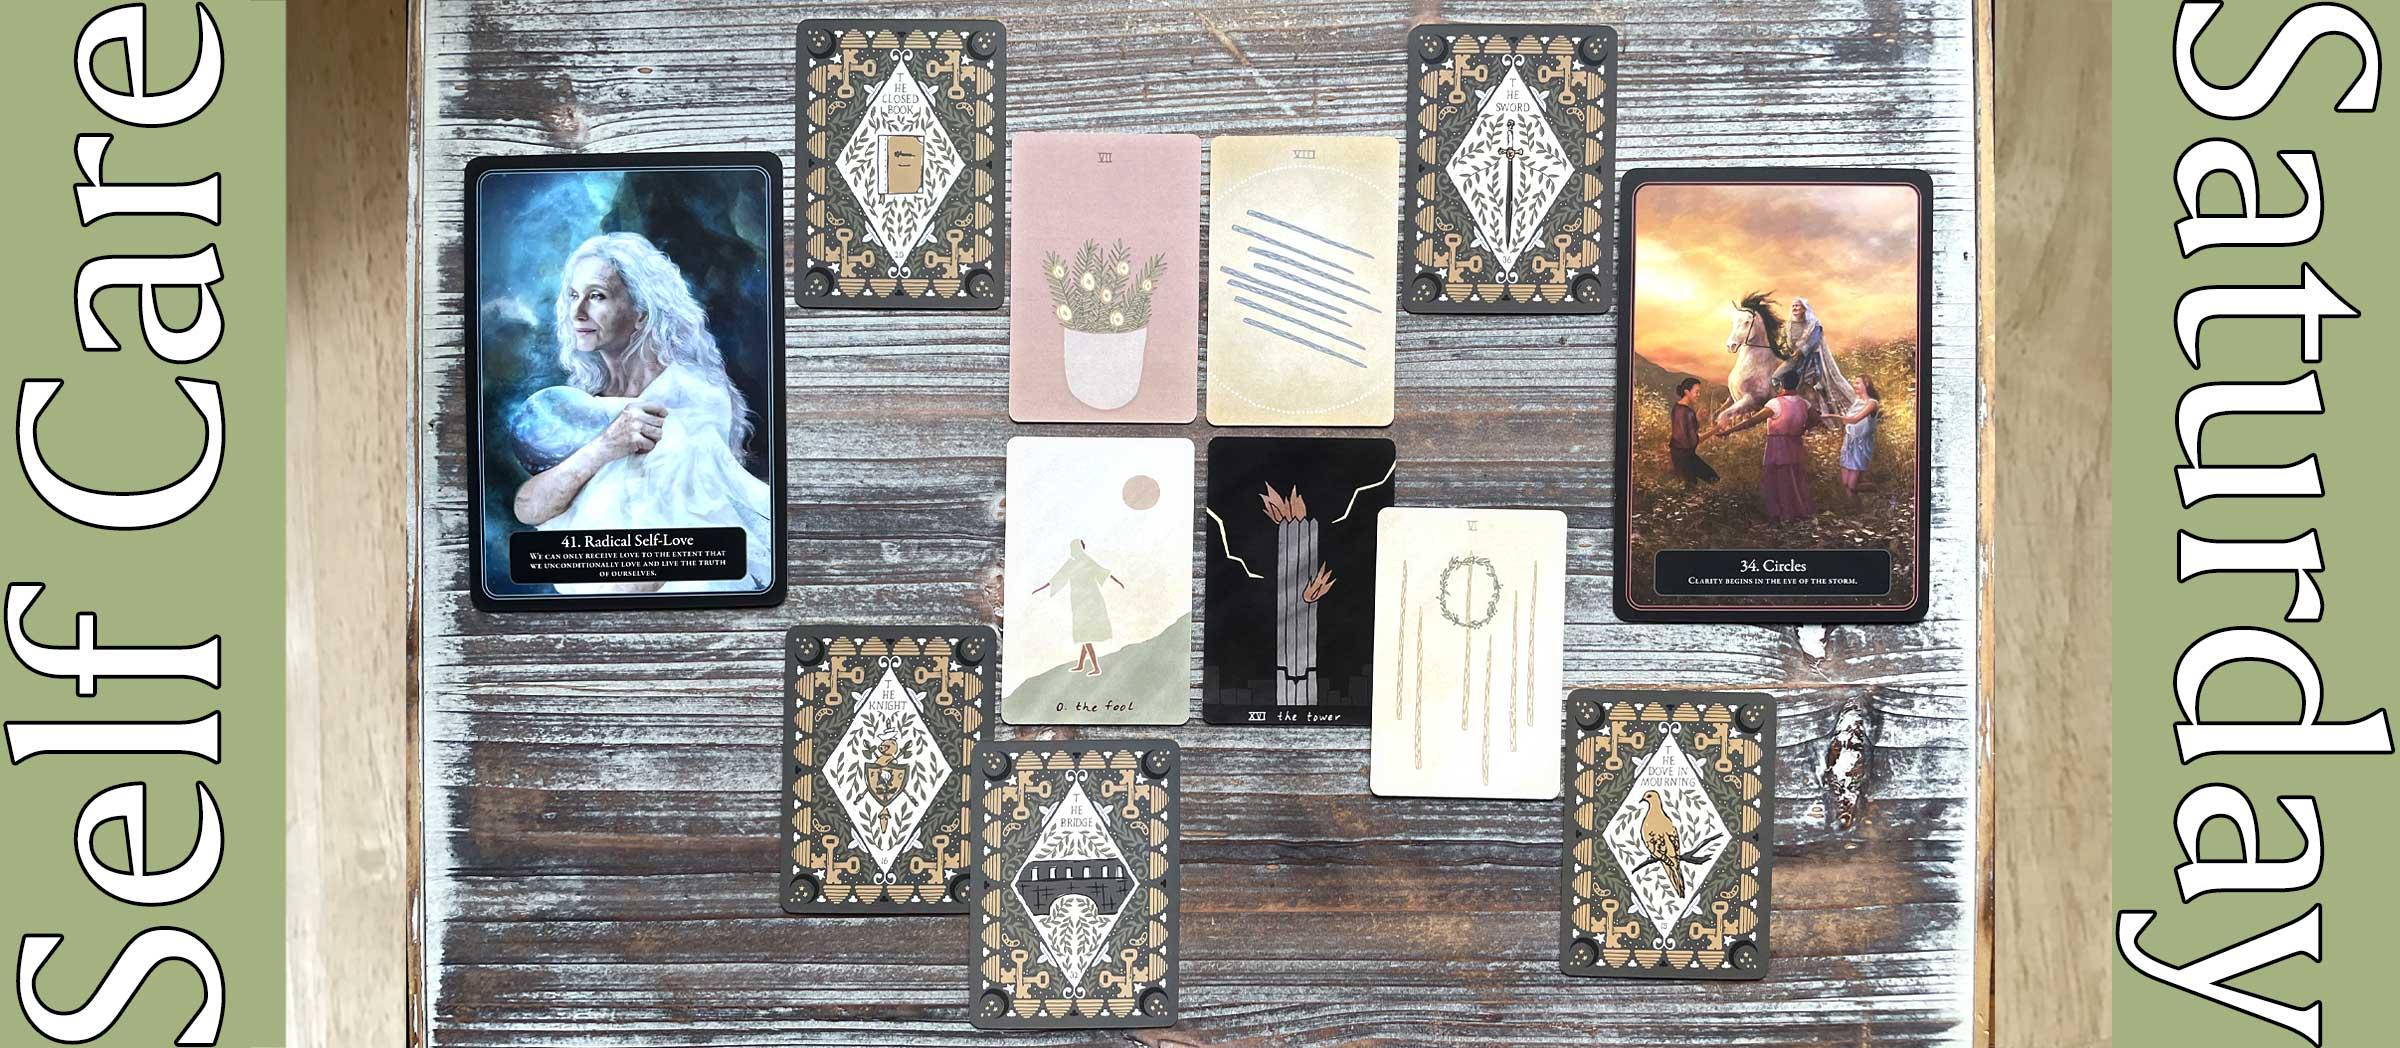 Mesquite Tarot, Elucidation Deck, Lantern Oracle